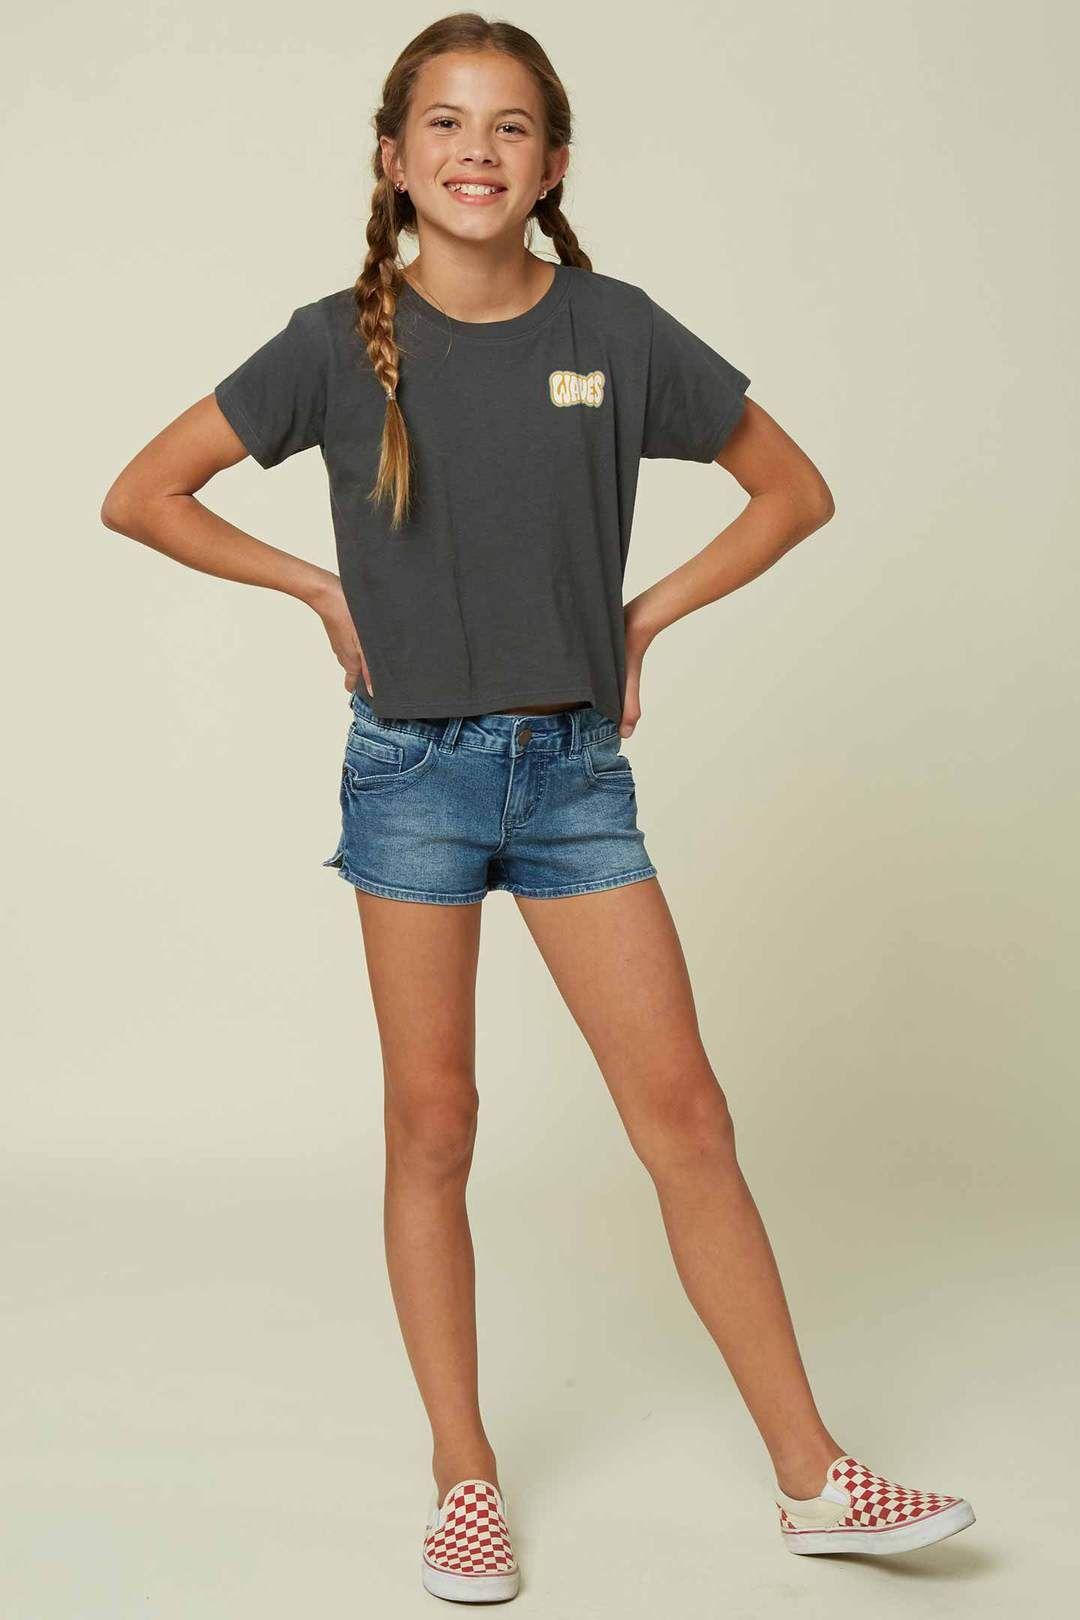 Girls waidley 2 shorts